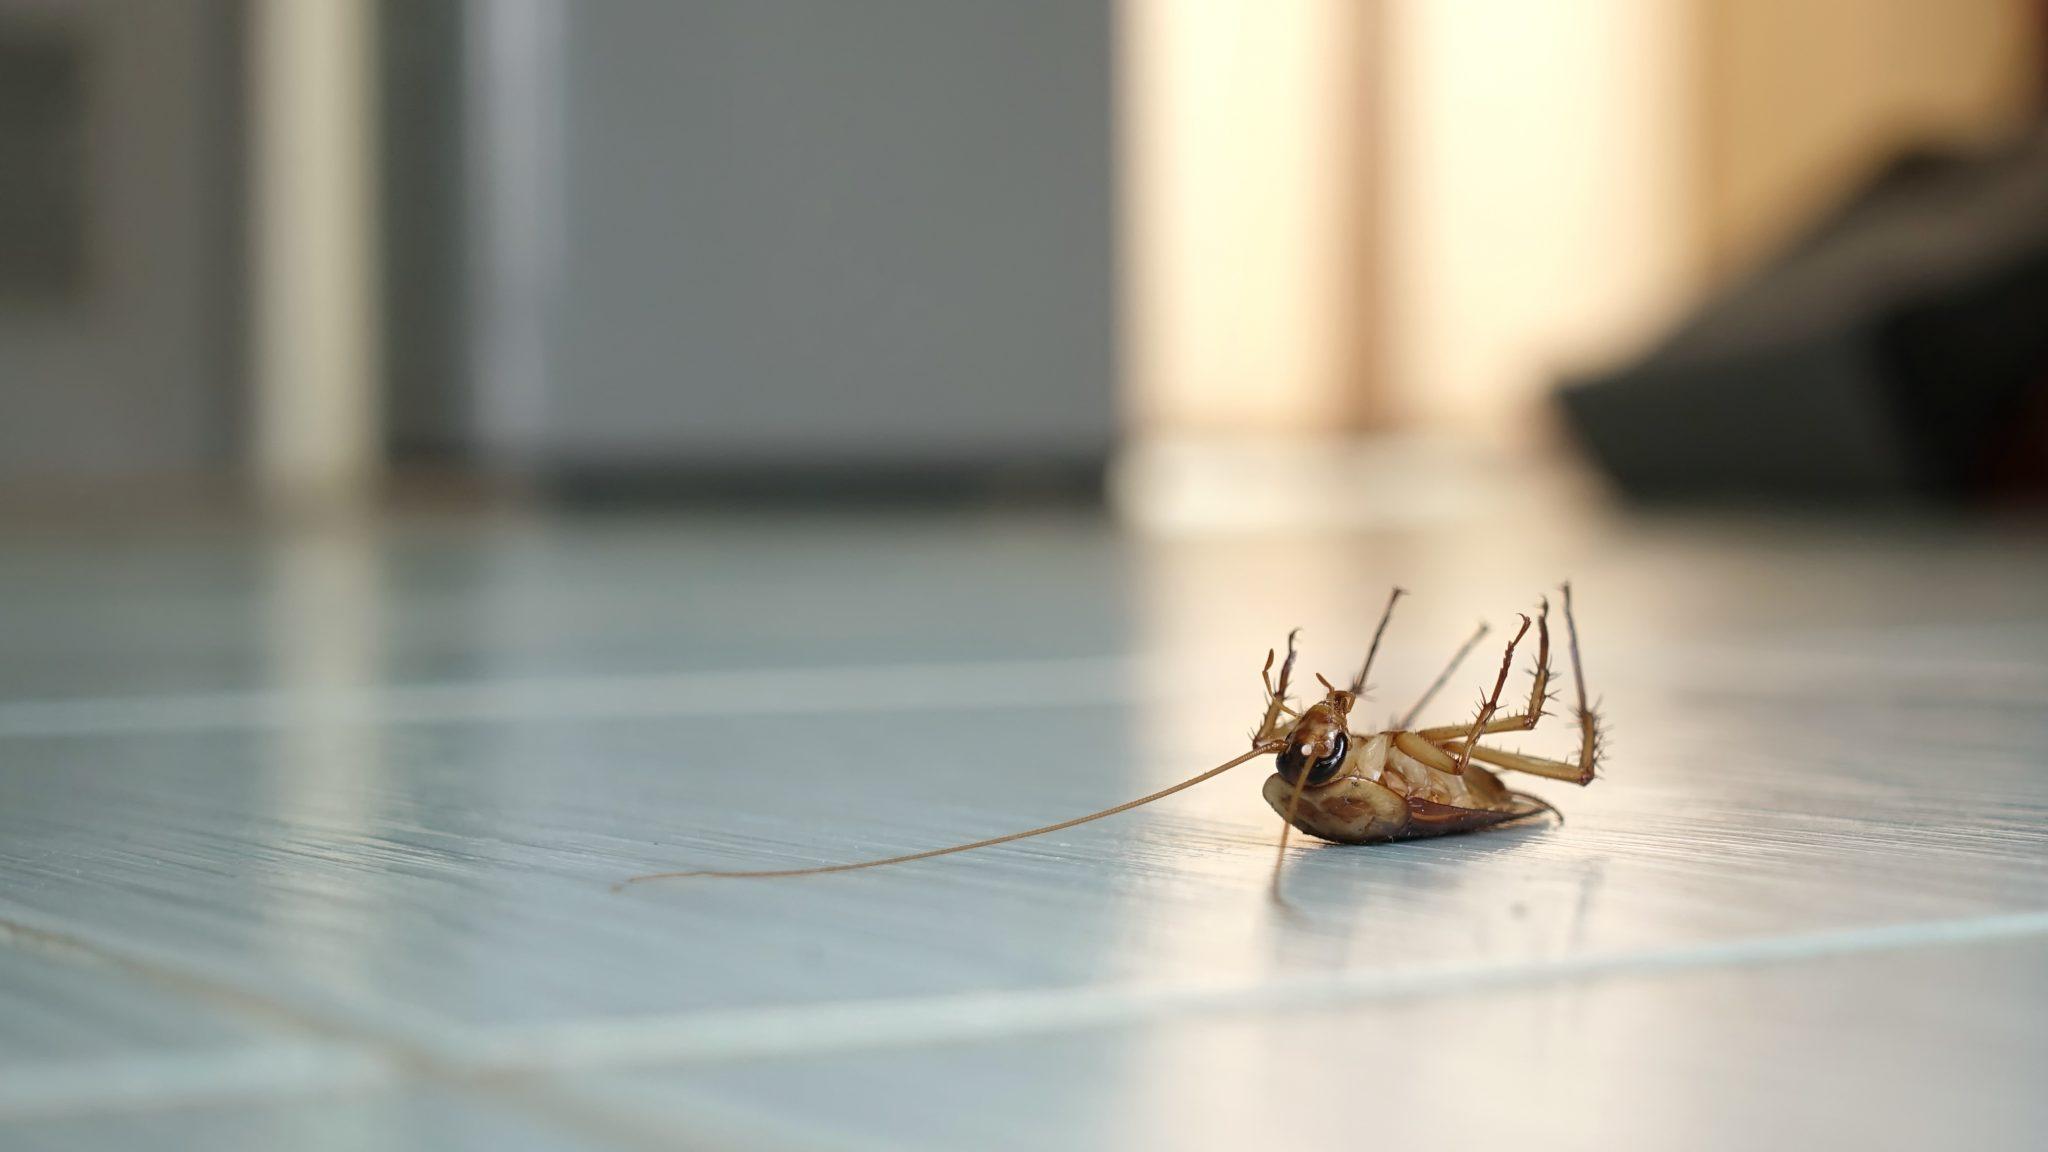 exterminators in Towson -- Raven Termite and Pest Control